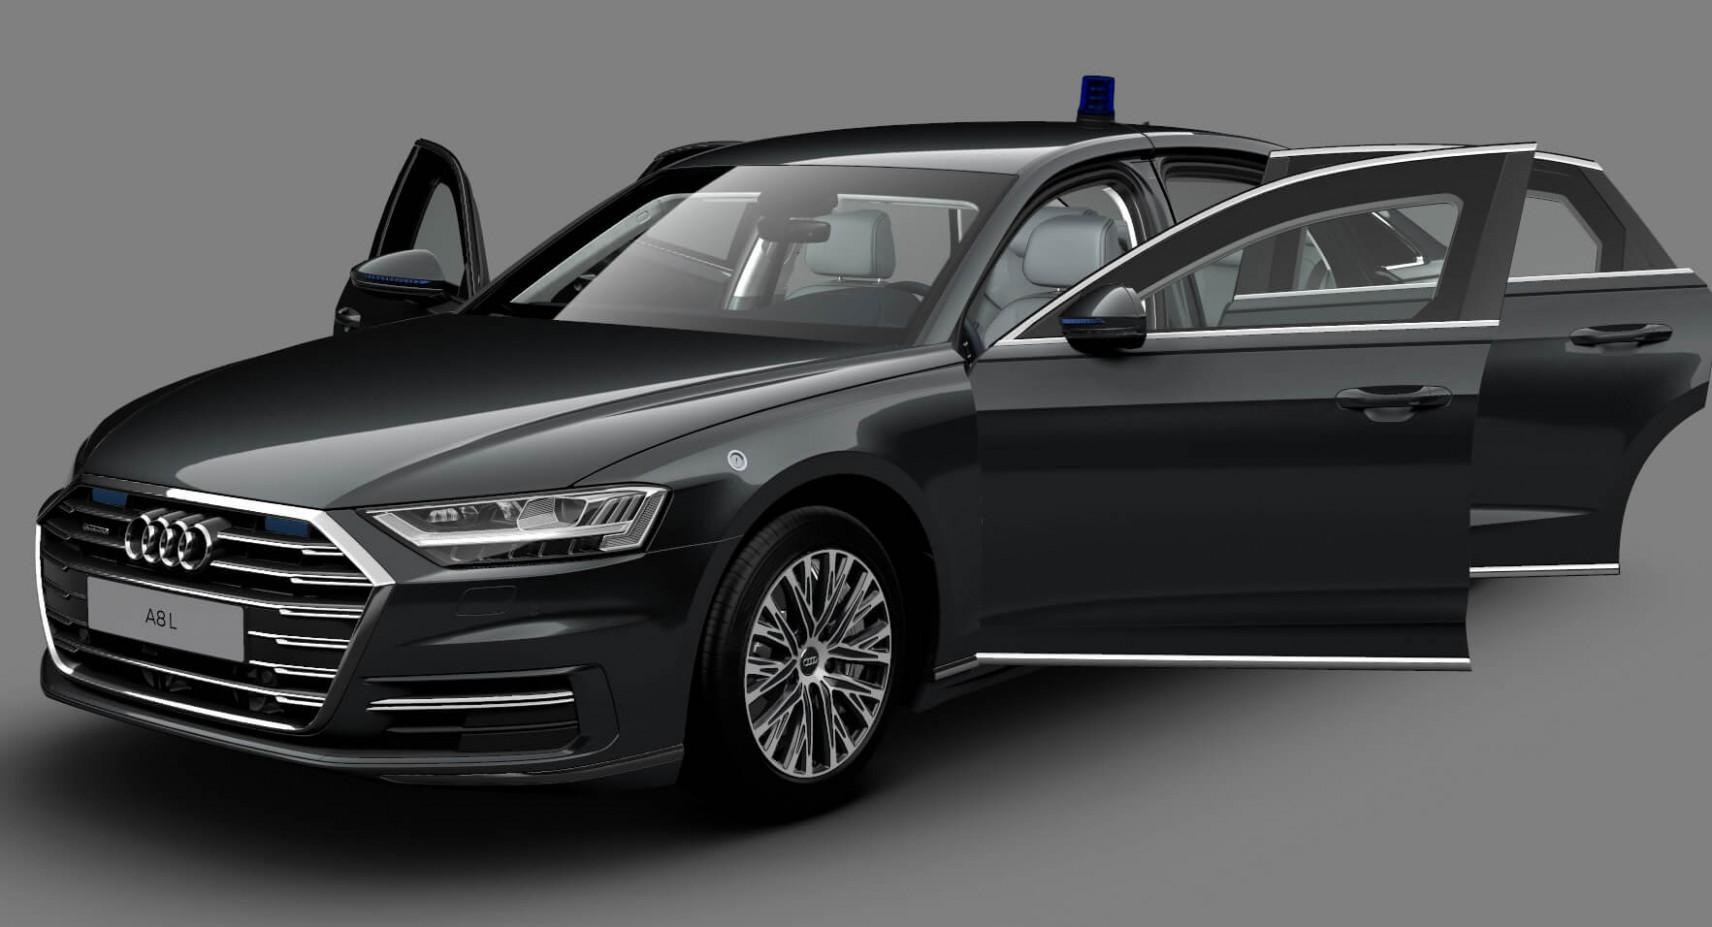 Wallpaper 2022 Audi A8 L In Usa